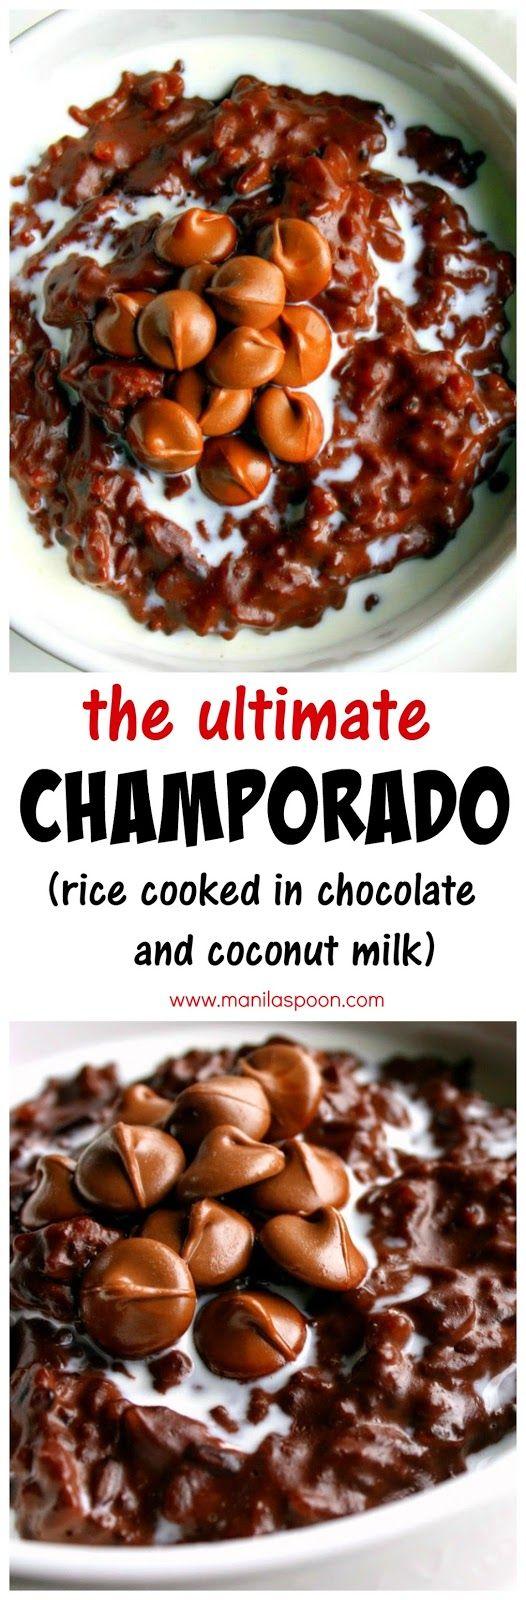 Photo of Champorado (Filipino Chocolate Rice Porridge/Pudding) – Manila Spoon